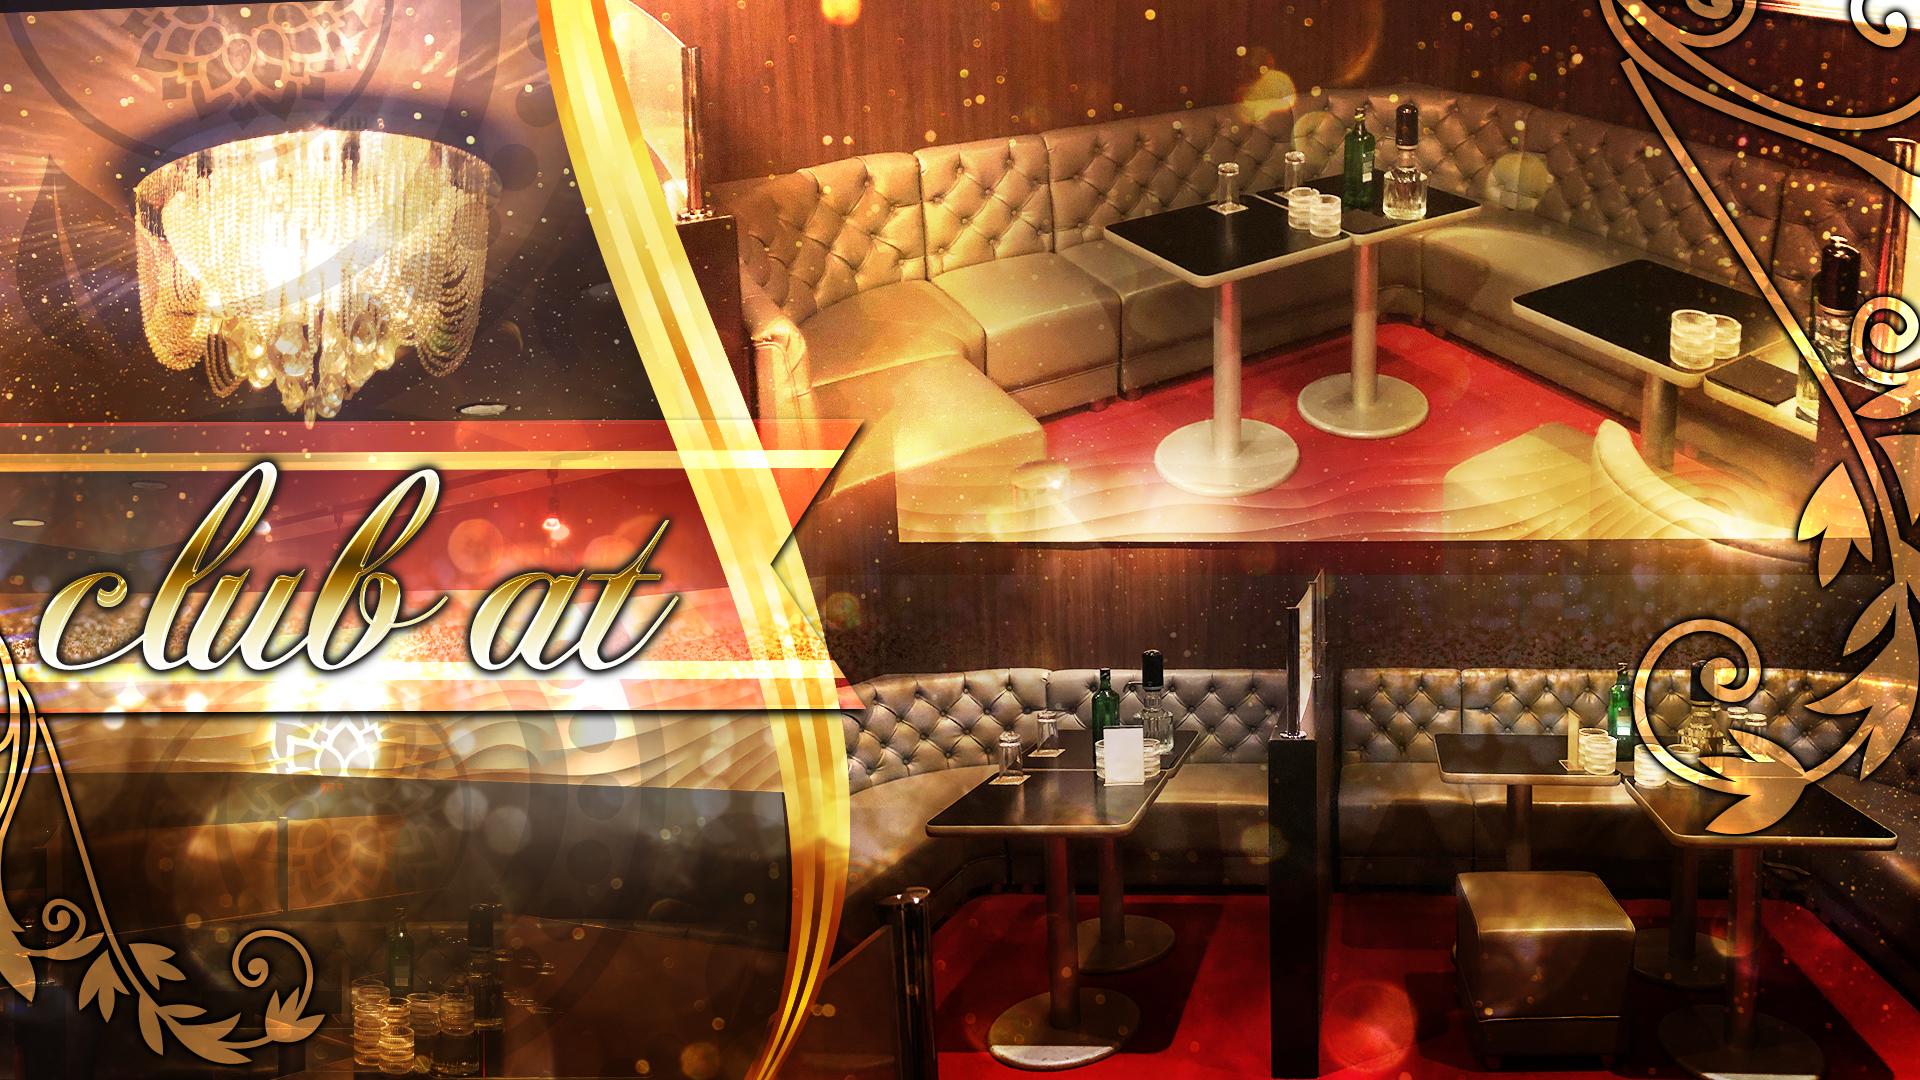 R's cafe[アールズカフェ] 本厚木 キャバクラ TOP画像